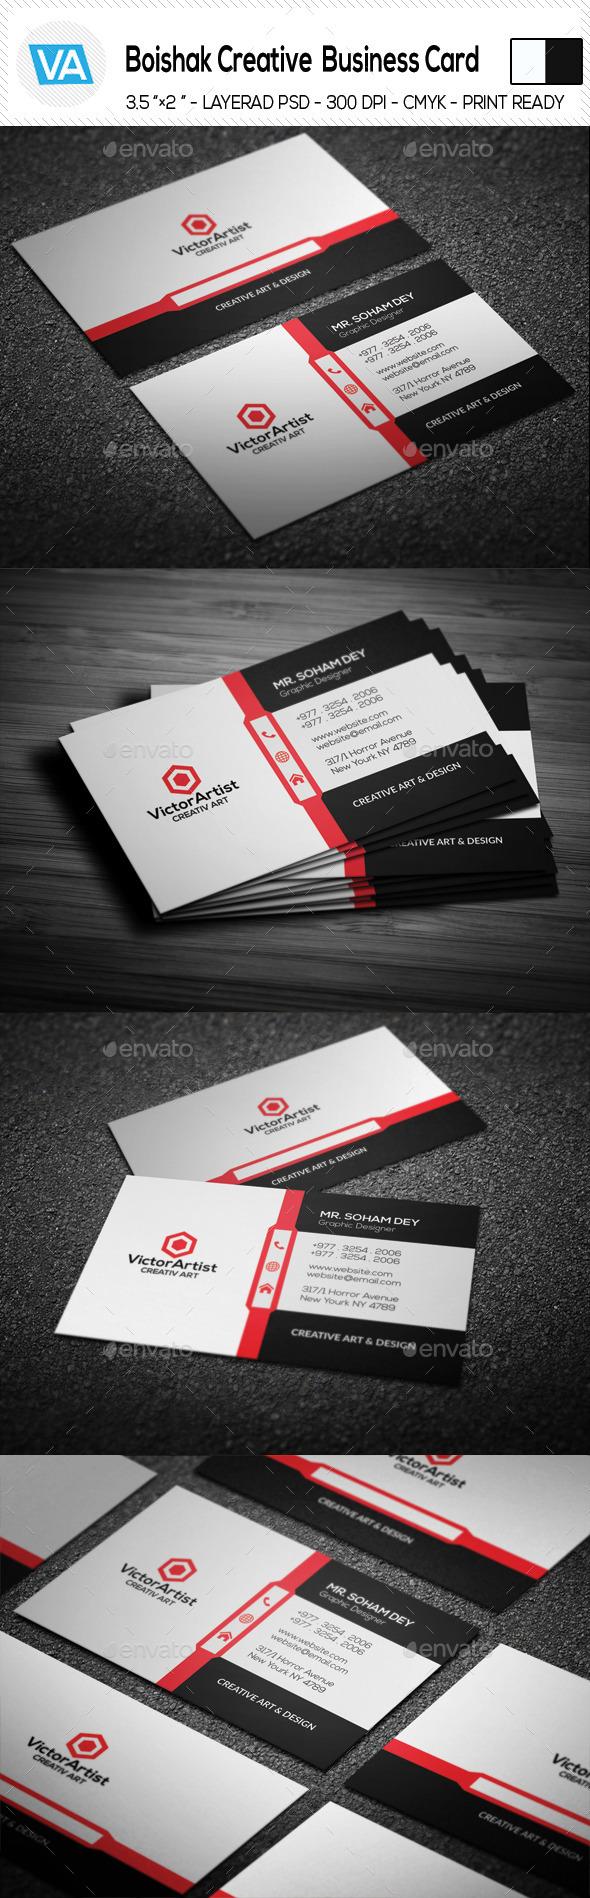 GraphicRiver Boishak Creative Business Card 11202688